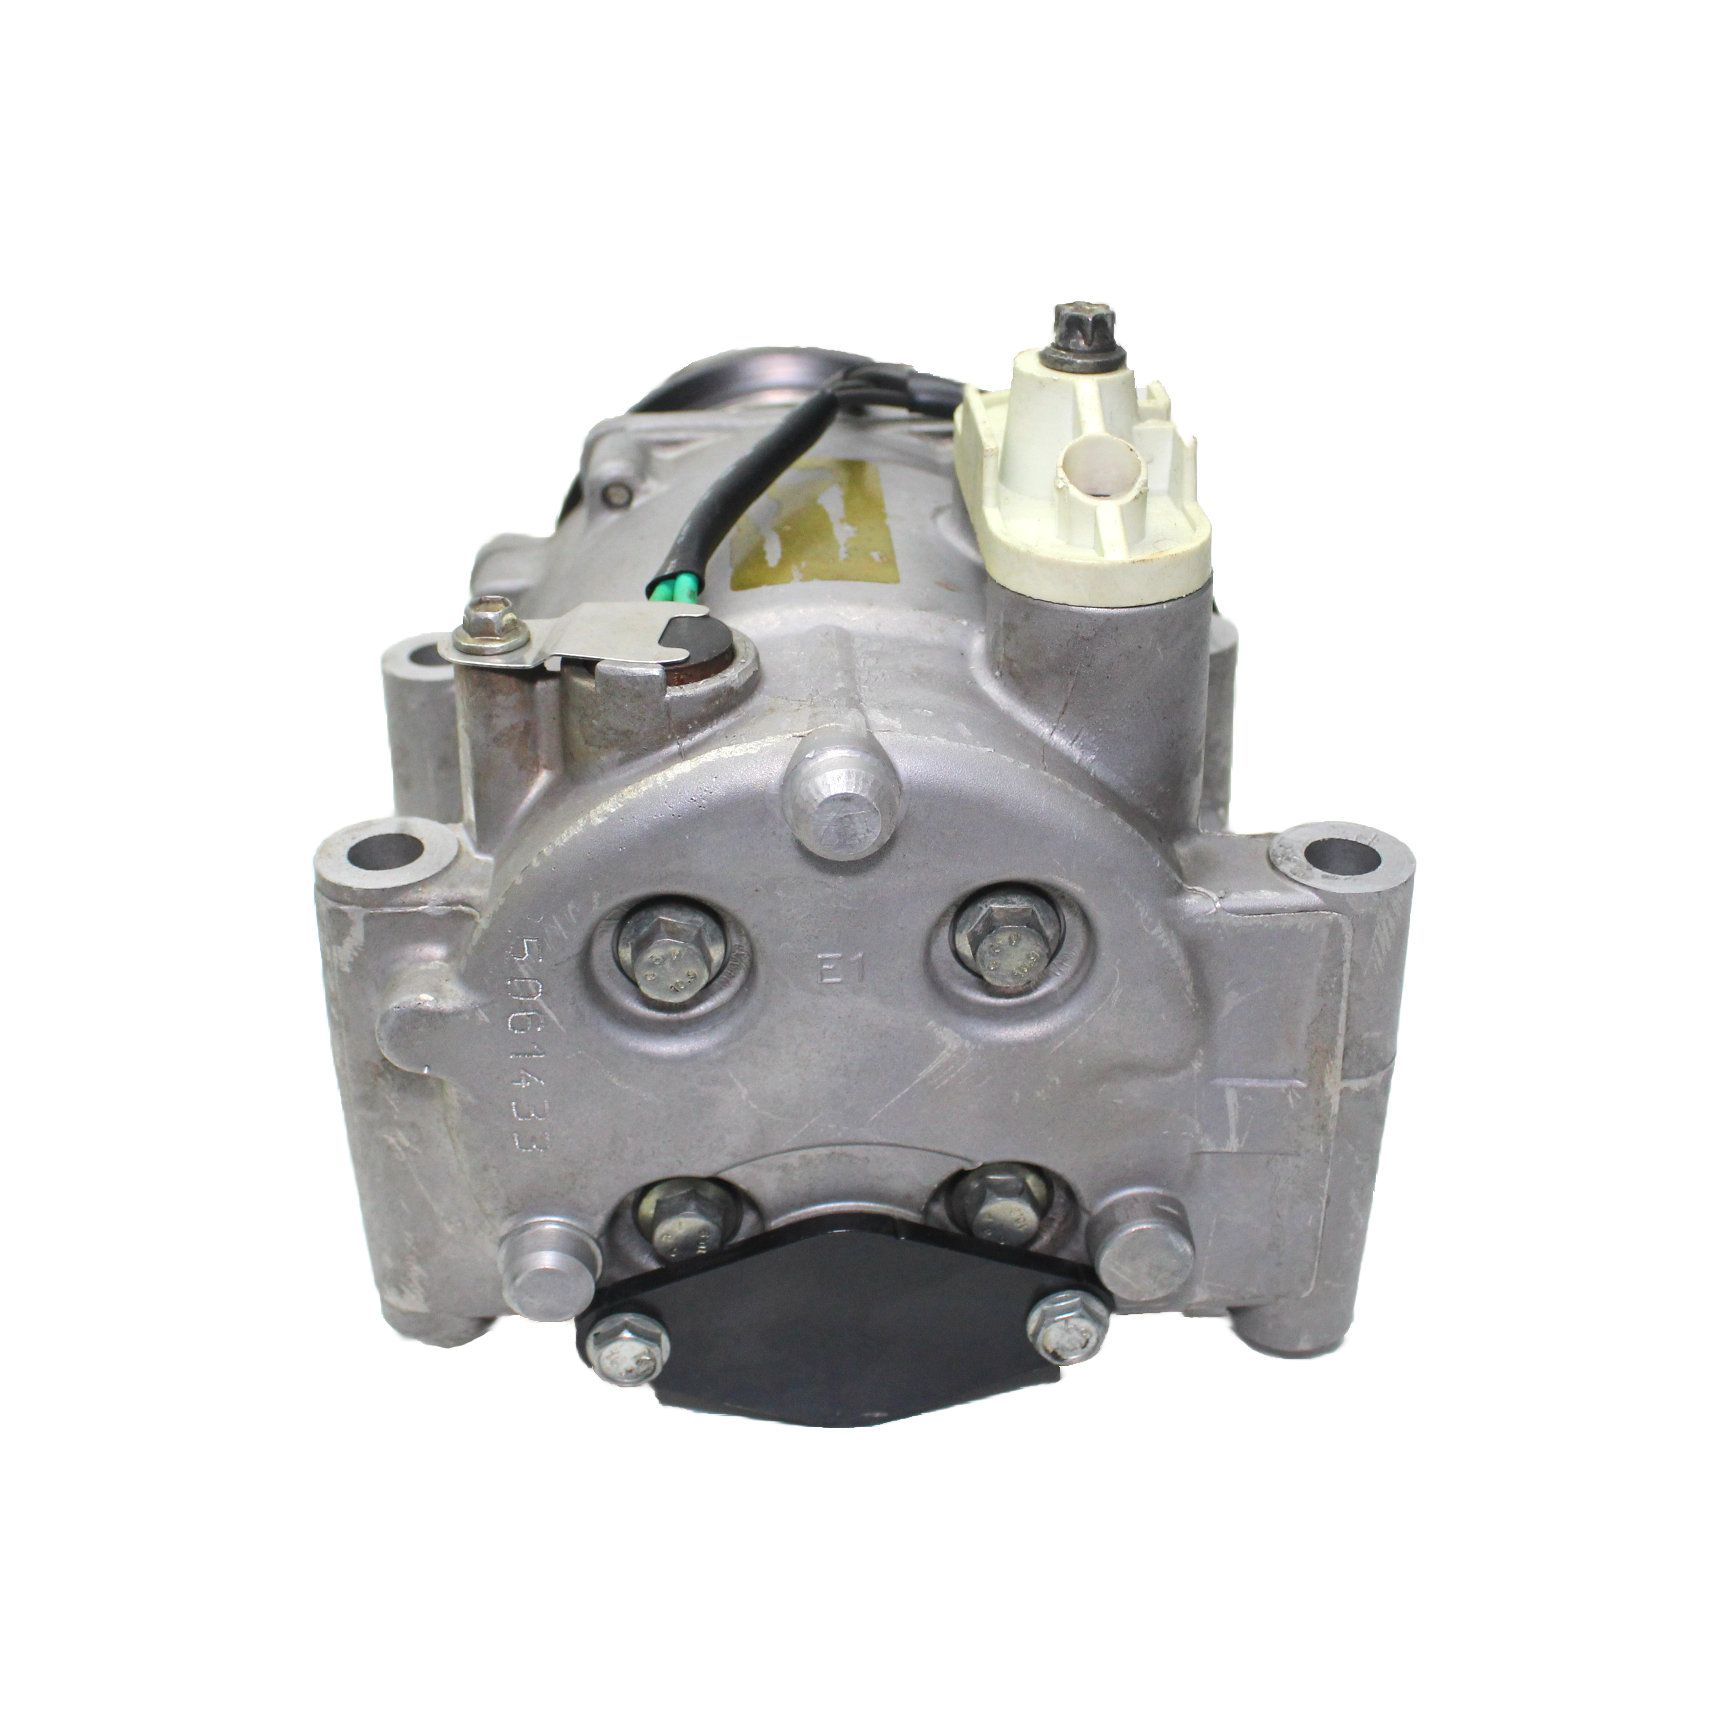 Compressor Ar Condicionado Focus Duratec 2.0 06...08